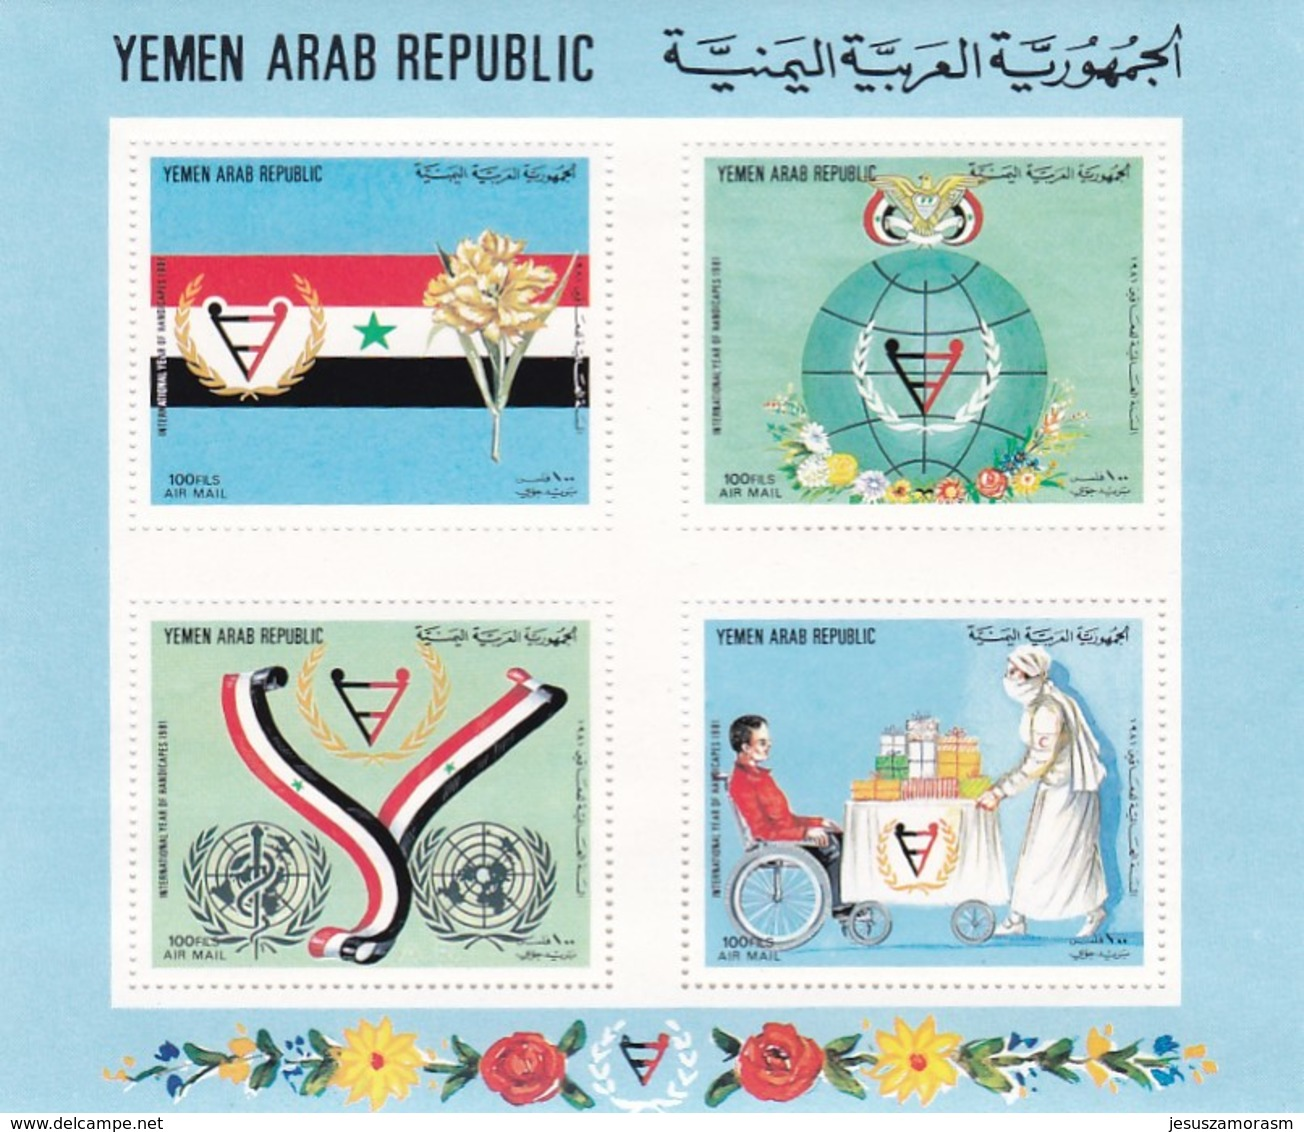 Yemen Hb Michel 220 - Yemen